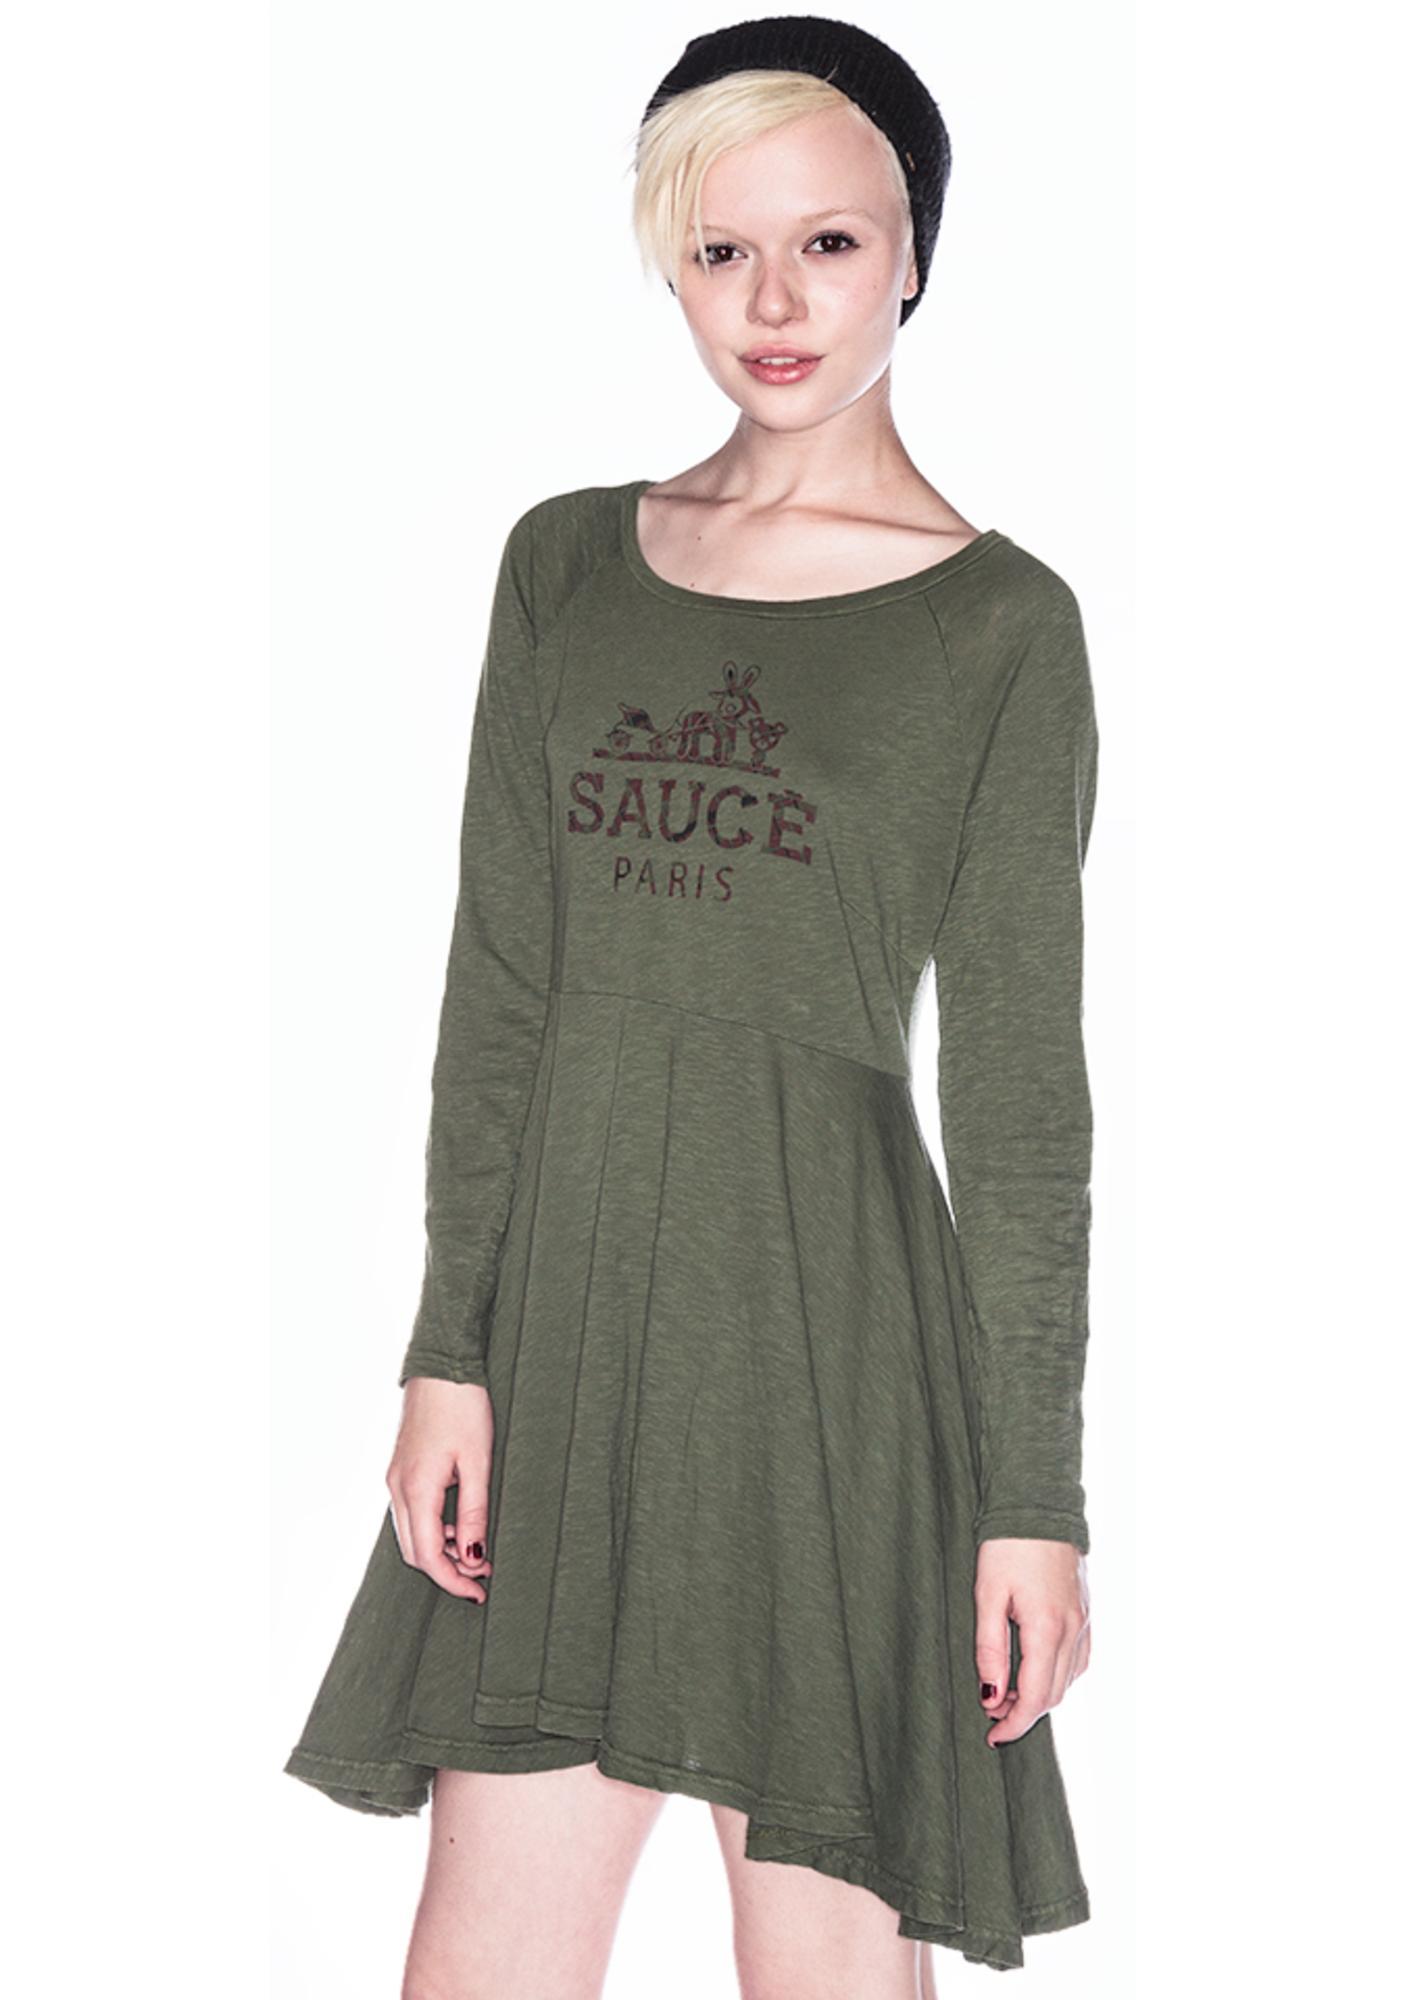 Sauce Window Dress